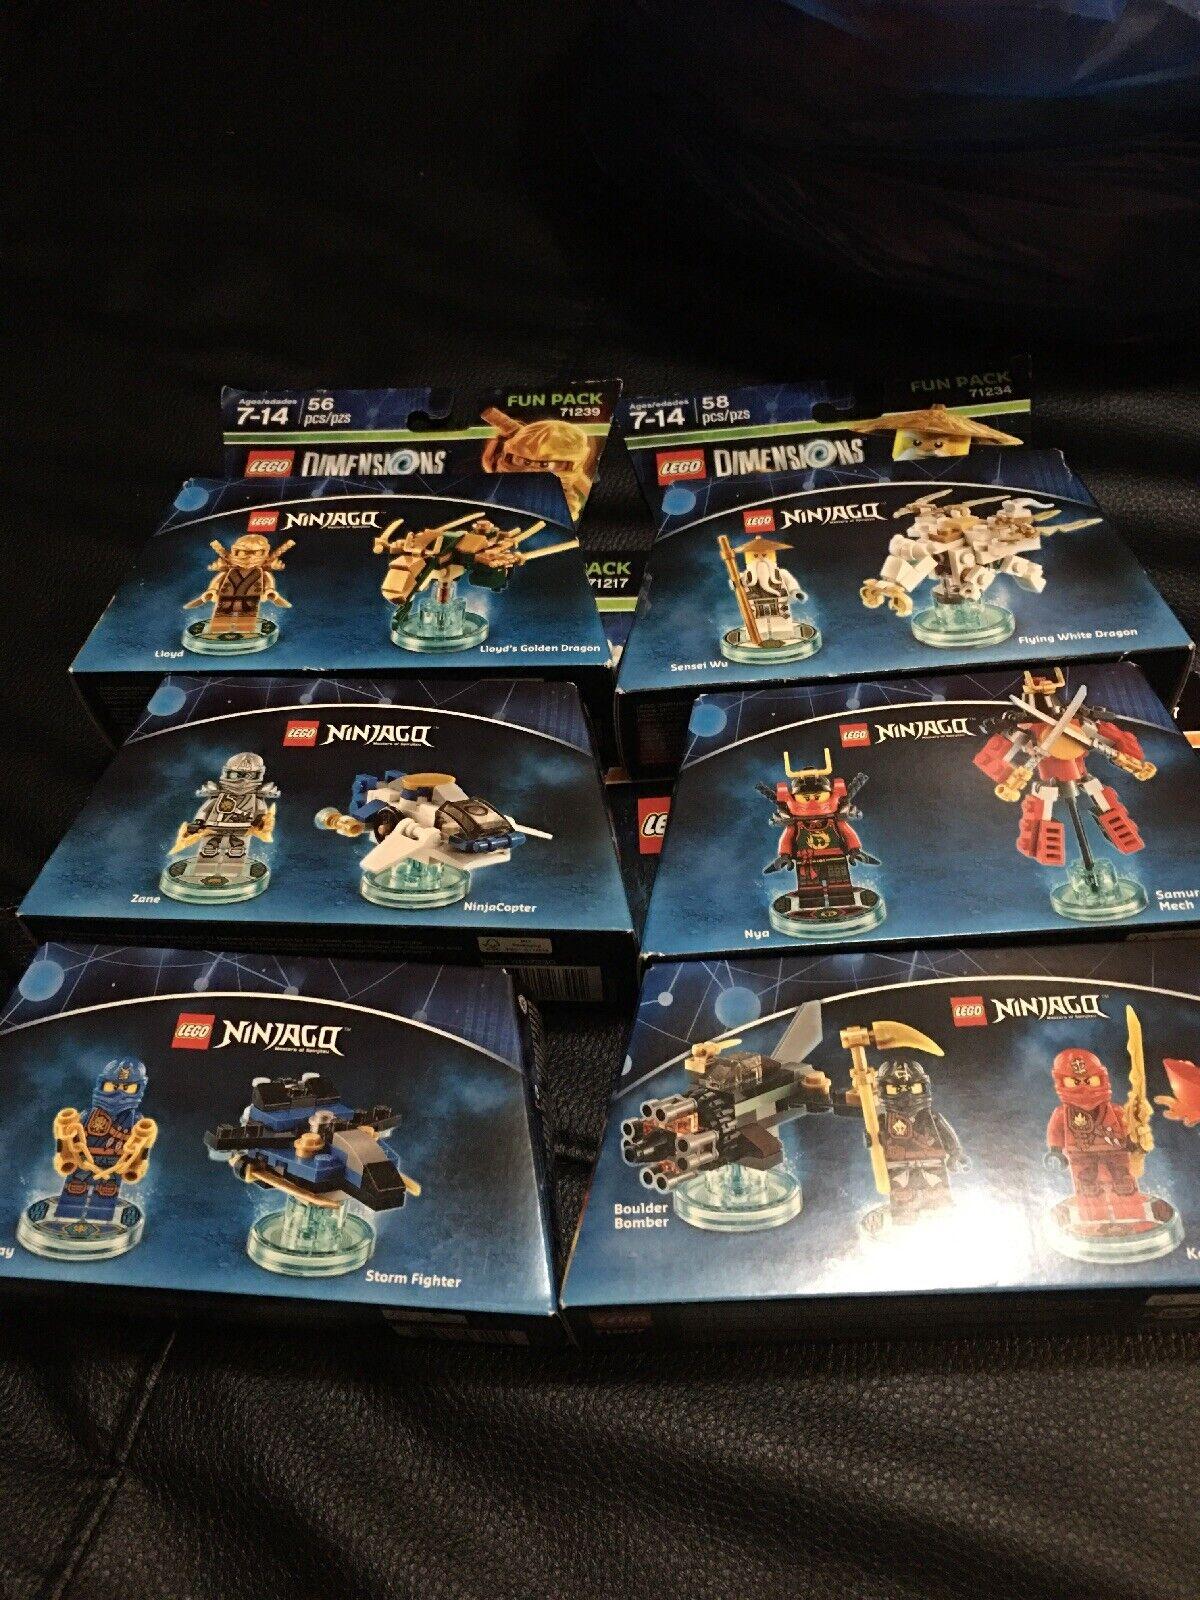 Tallas De Lego Ninjago Set Completo 71207 71215 71216 71217 71234, 71239